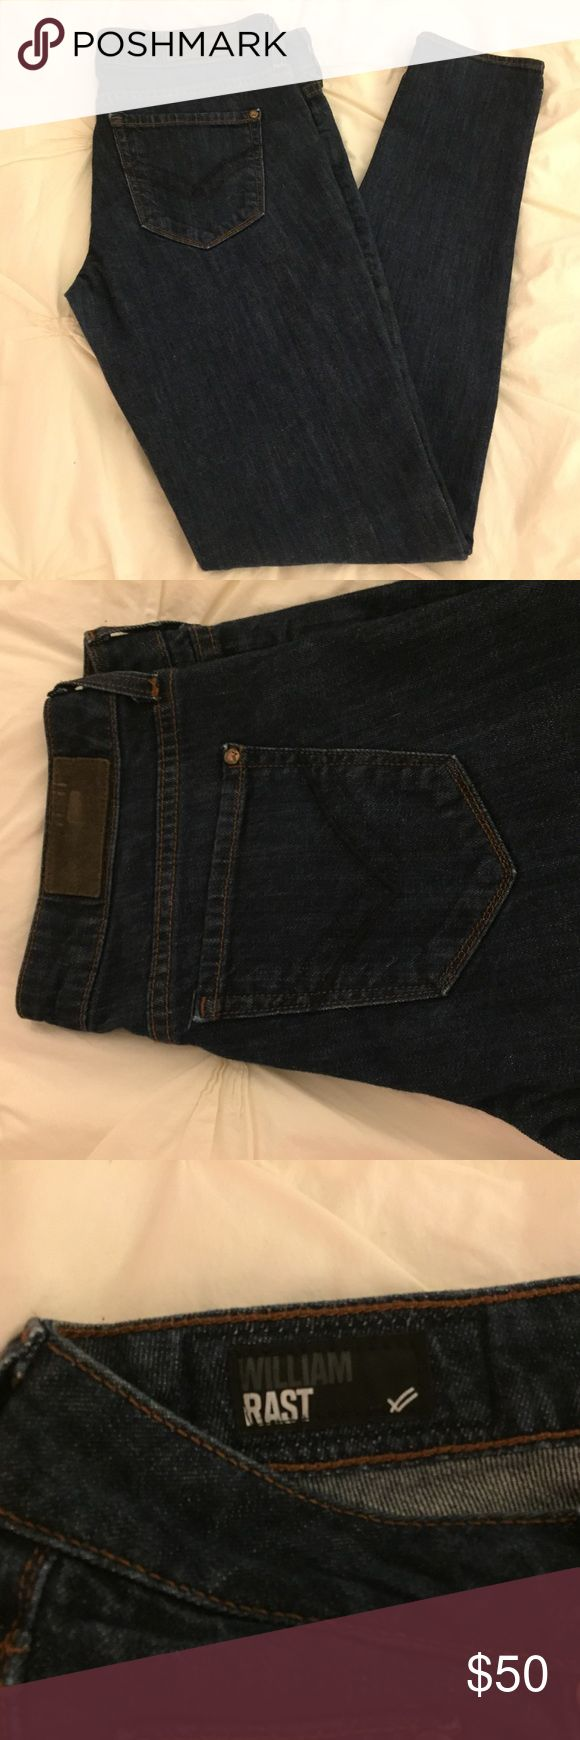 "William Rast jeans William Rast skinny jeans 41"" inseam cotton elastane William Rast Jeans Skinny"